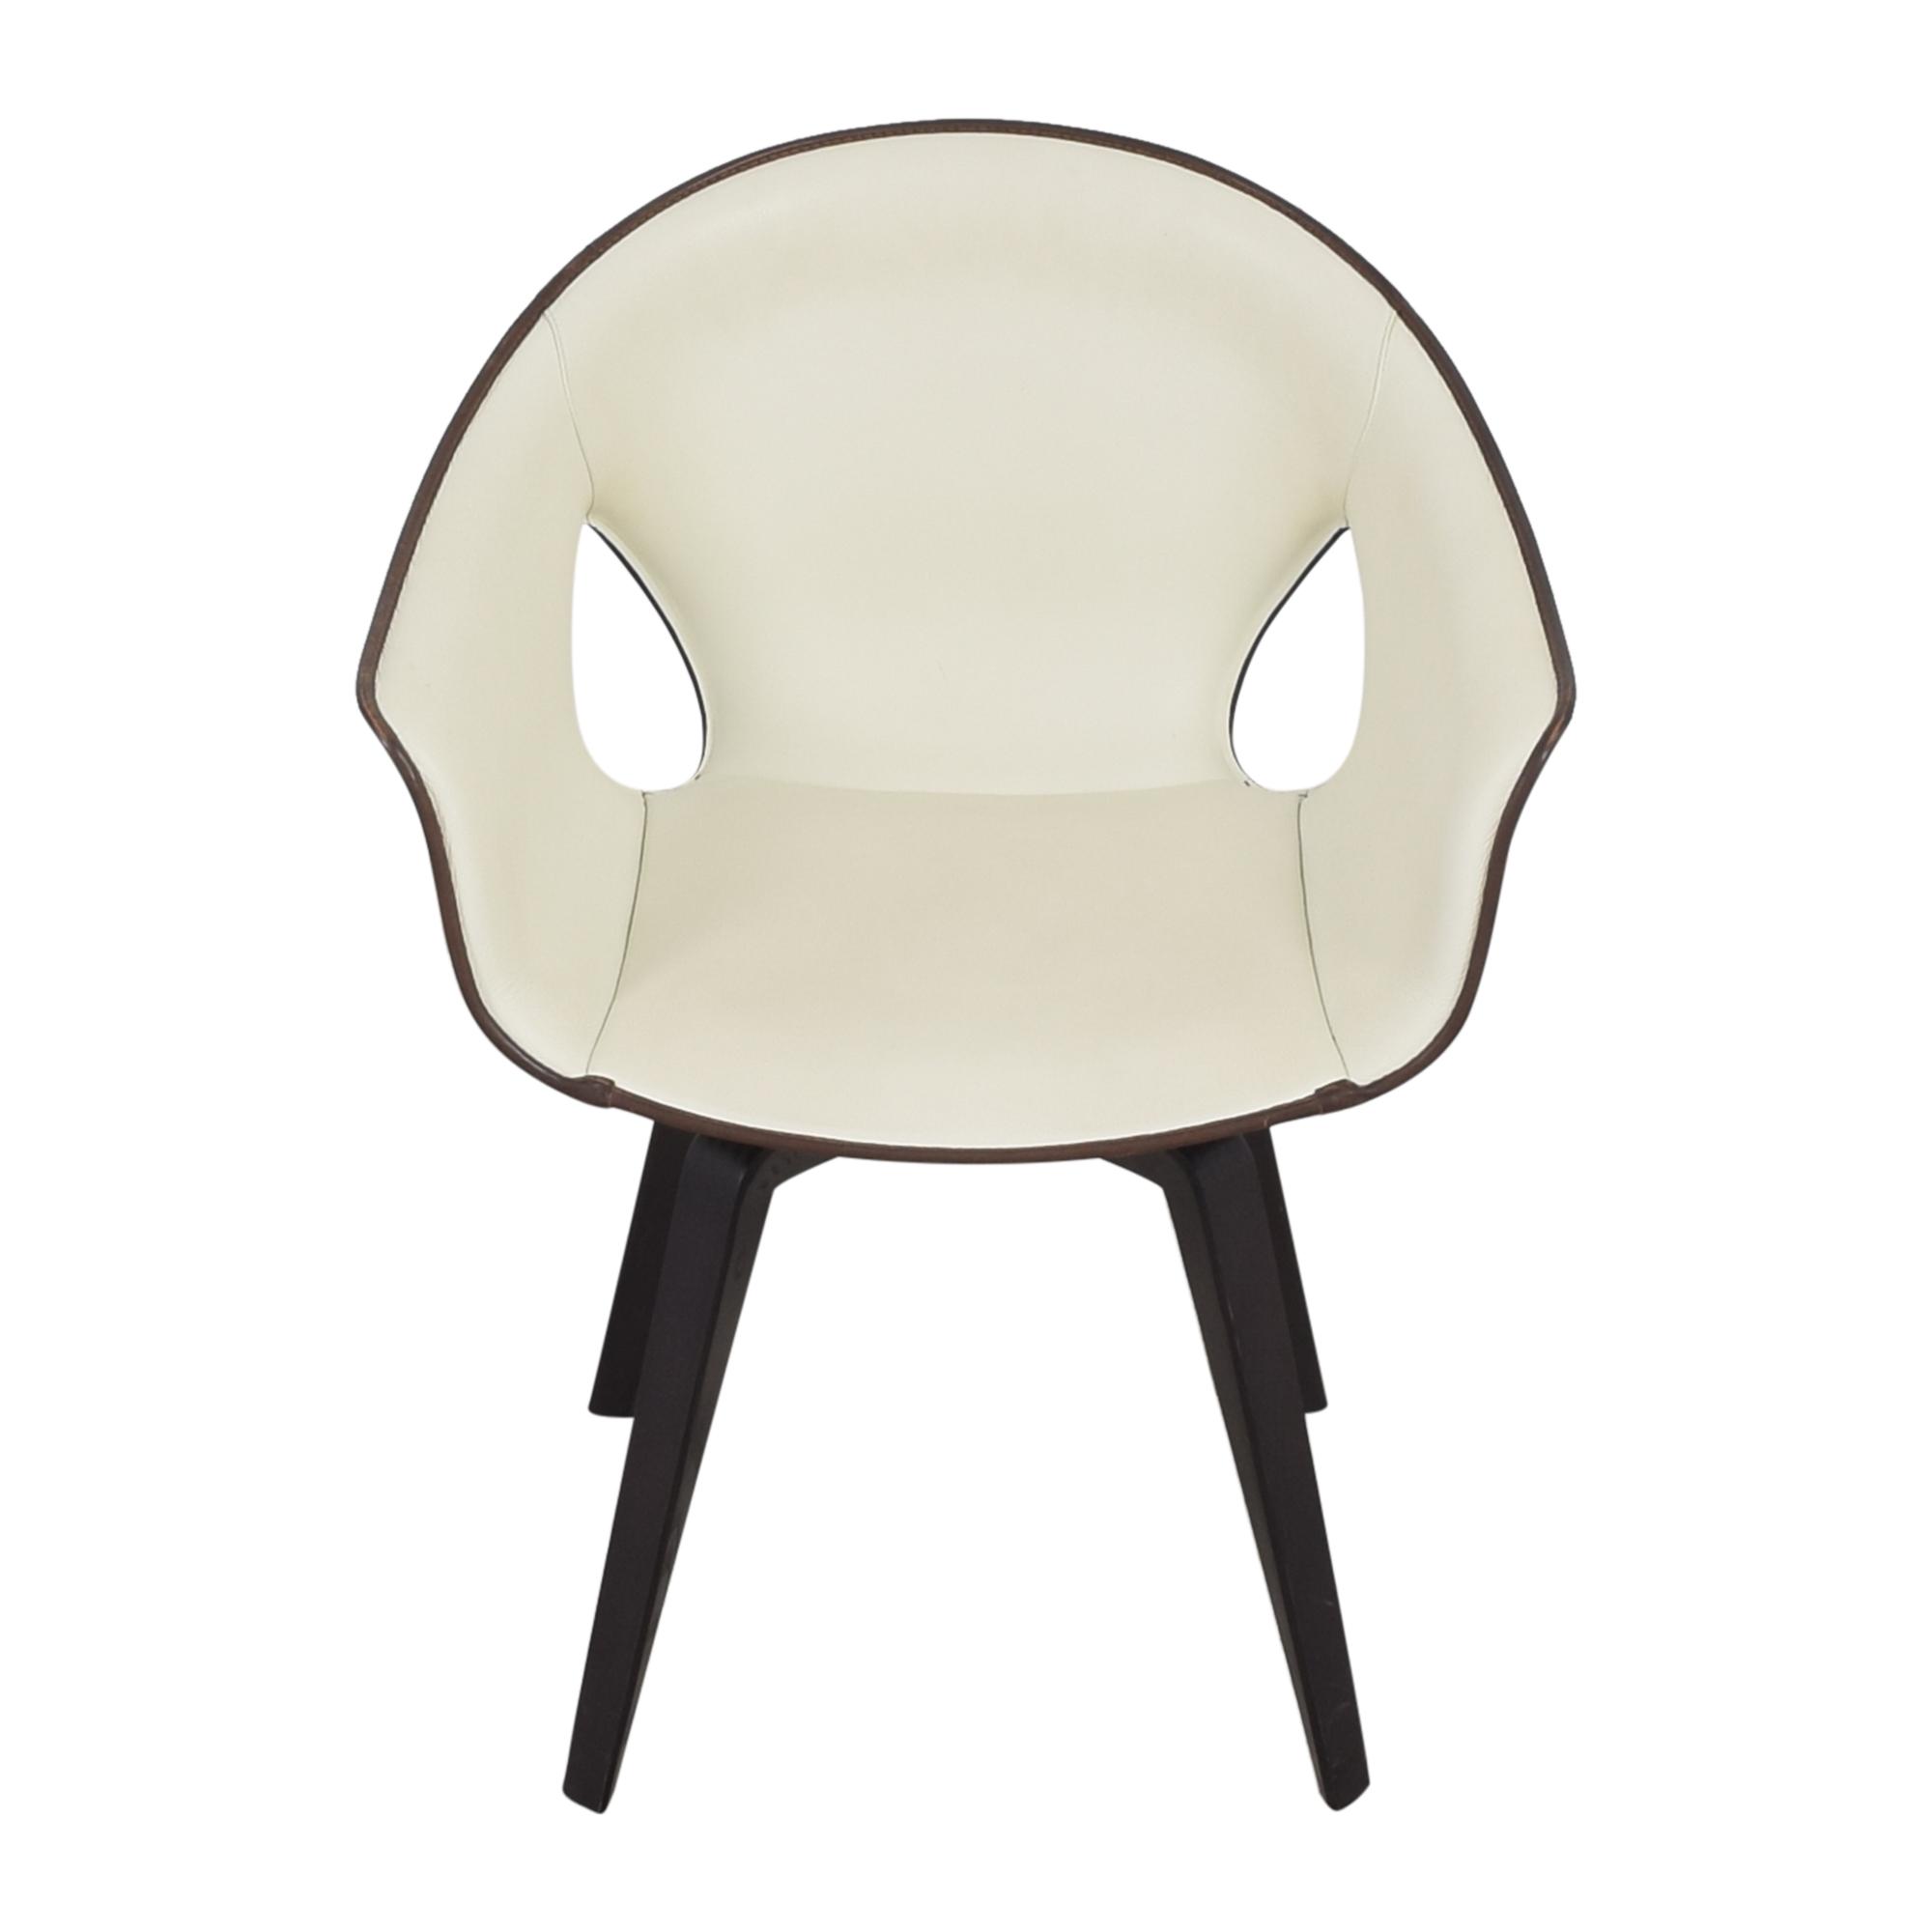 buy Poltrona Frau Ginger Side Chair Poltrona Frau Accent Chairs